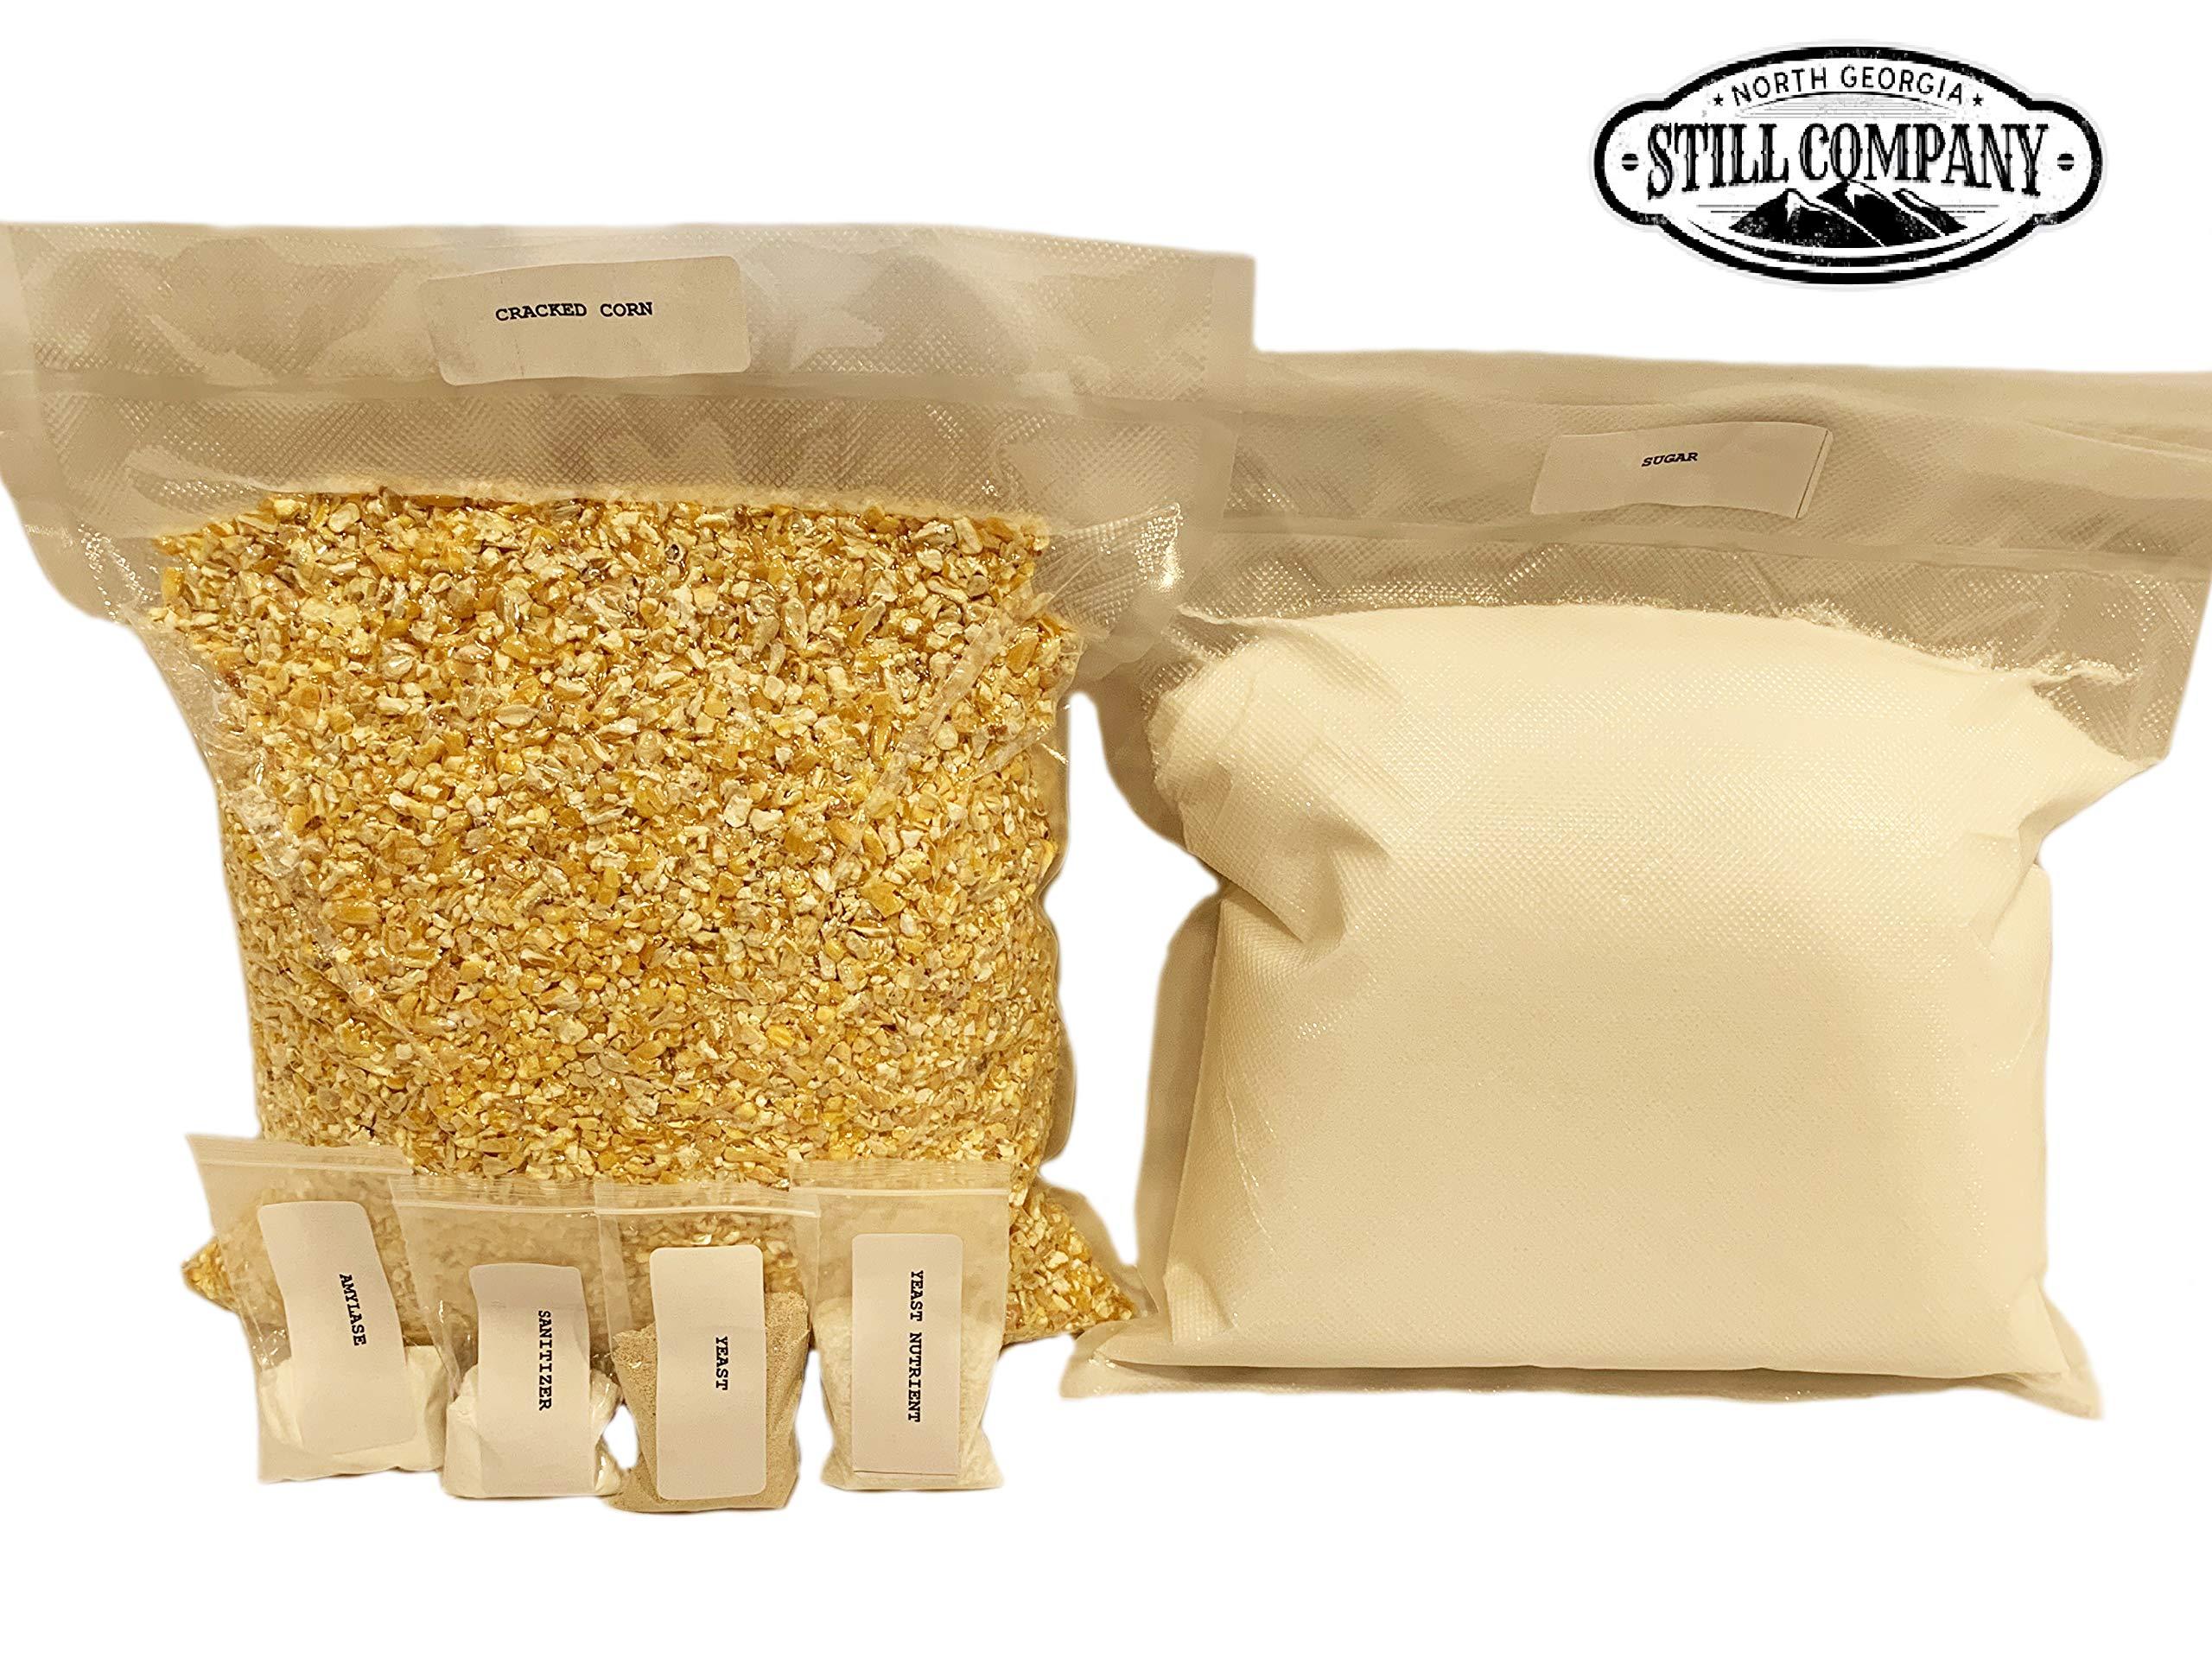 Genuine North Georgia Still Company Complete Corn Whiskey Mash & Fermentation Kit